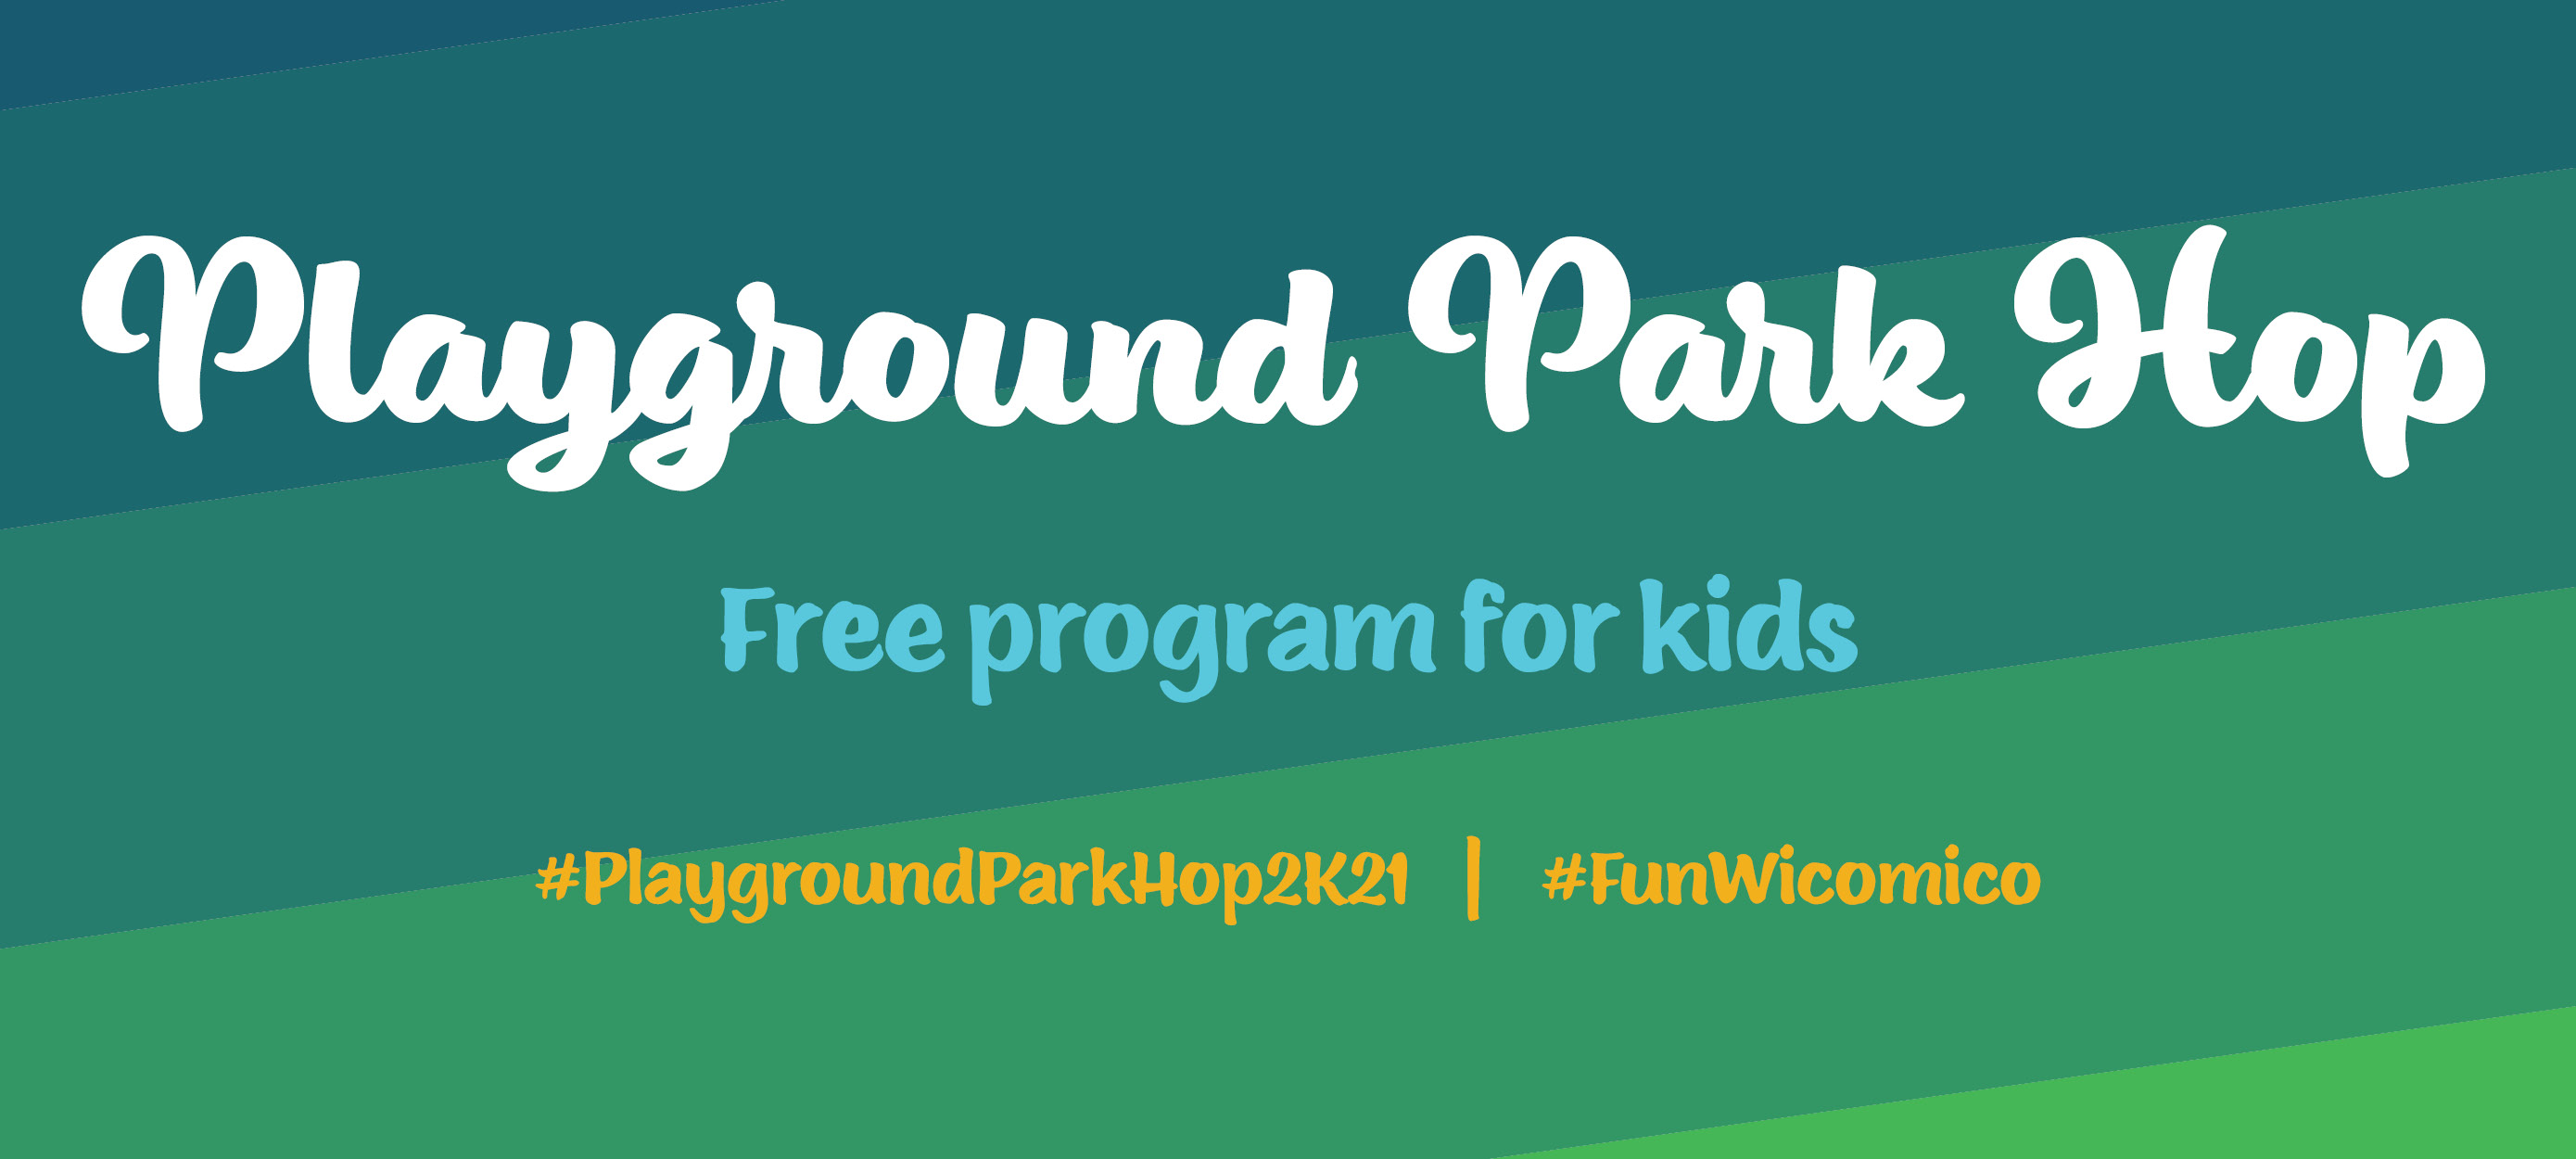 Playground Park Hop